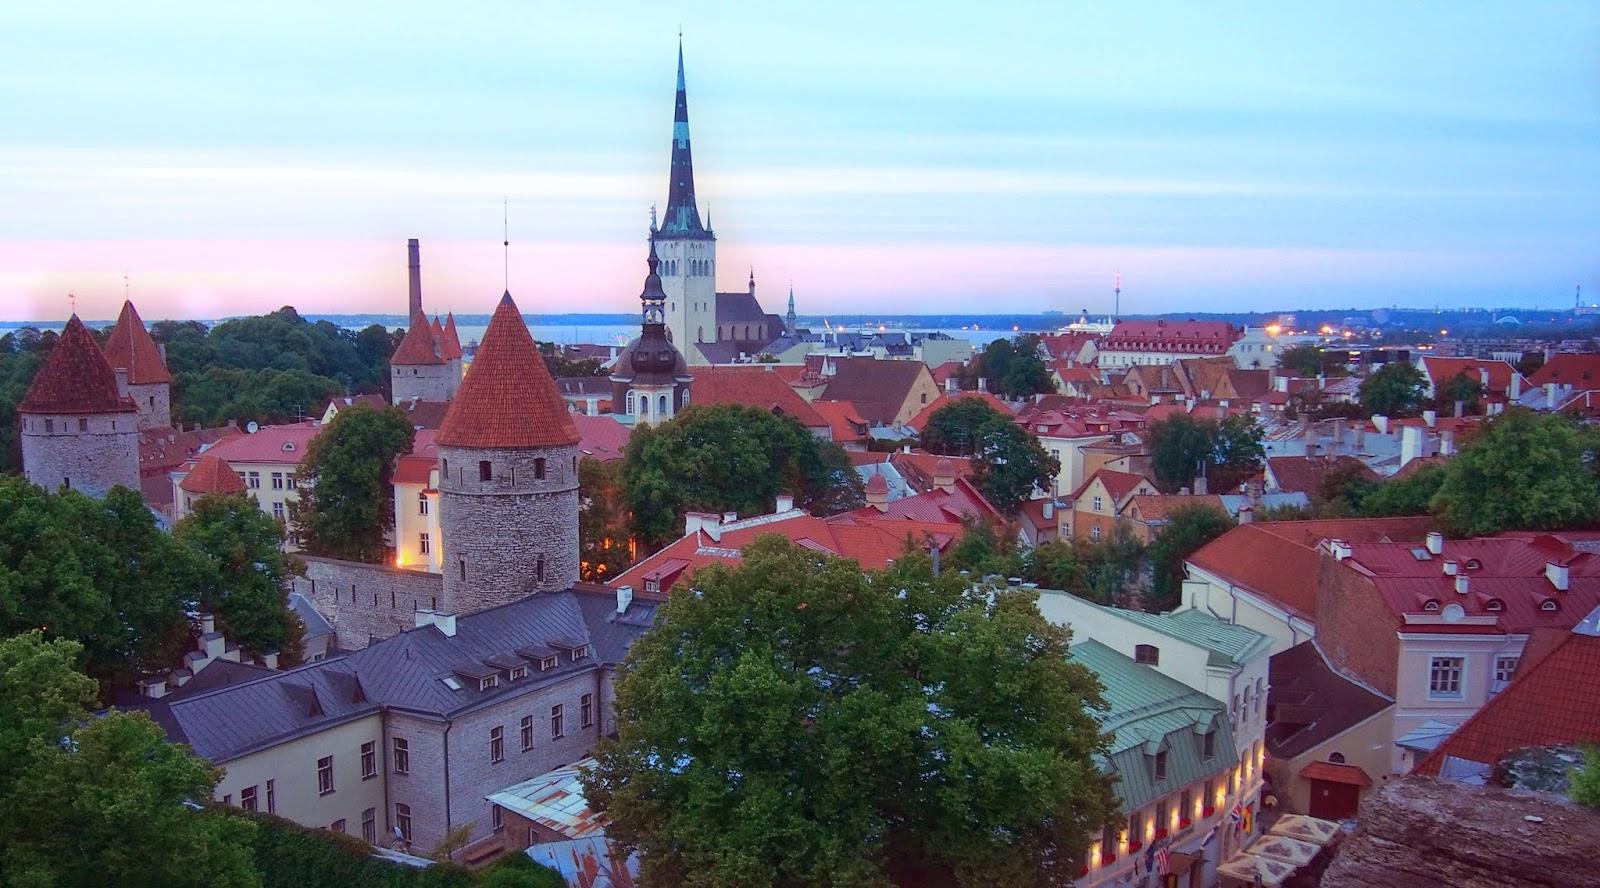 prostituutio suomessa hinta massage girl sex video